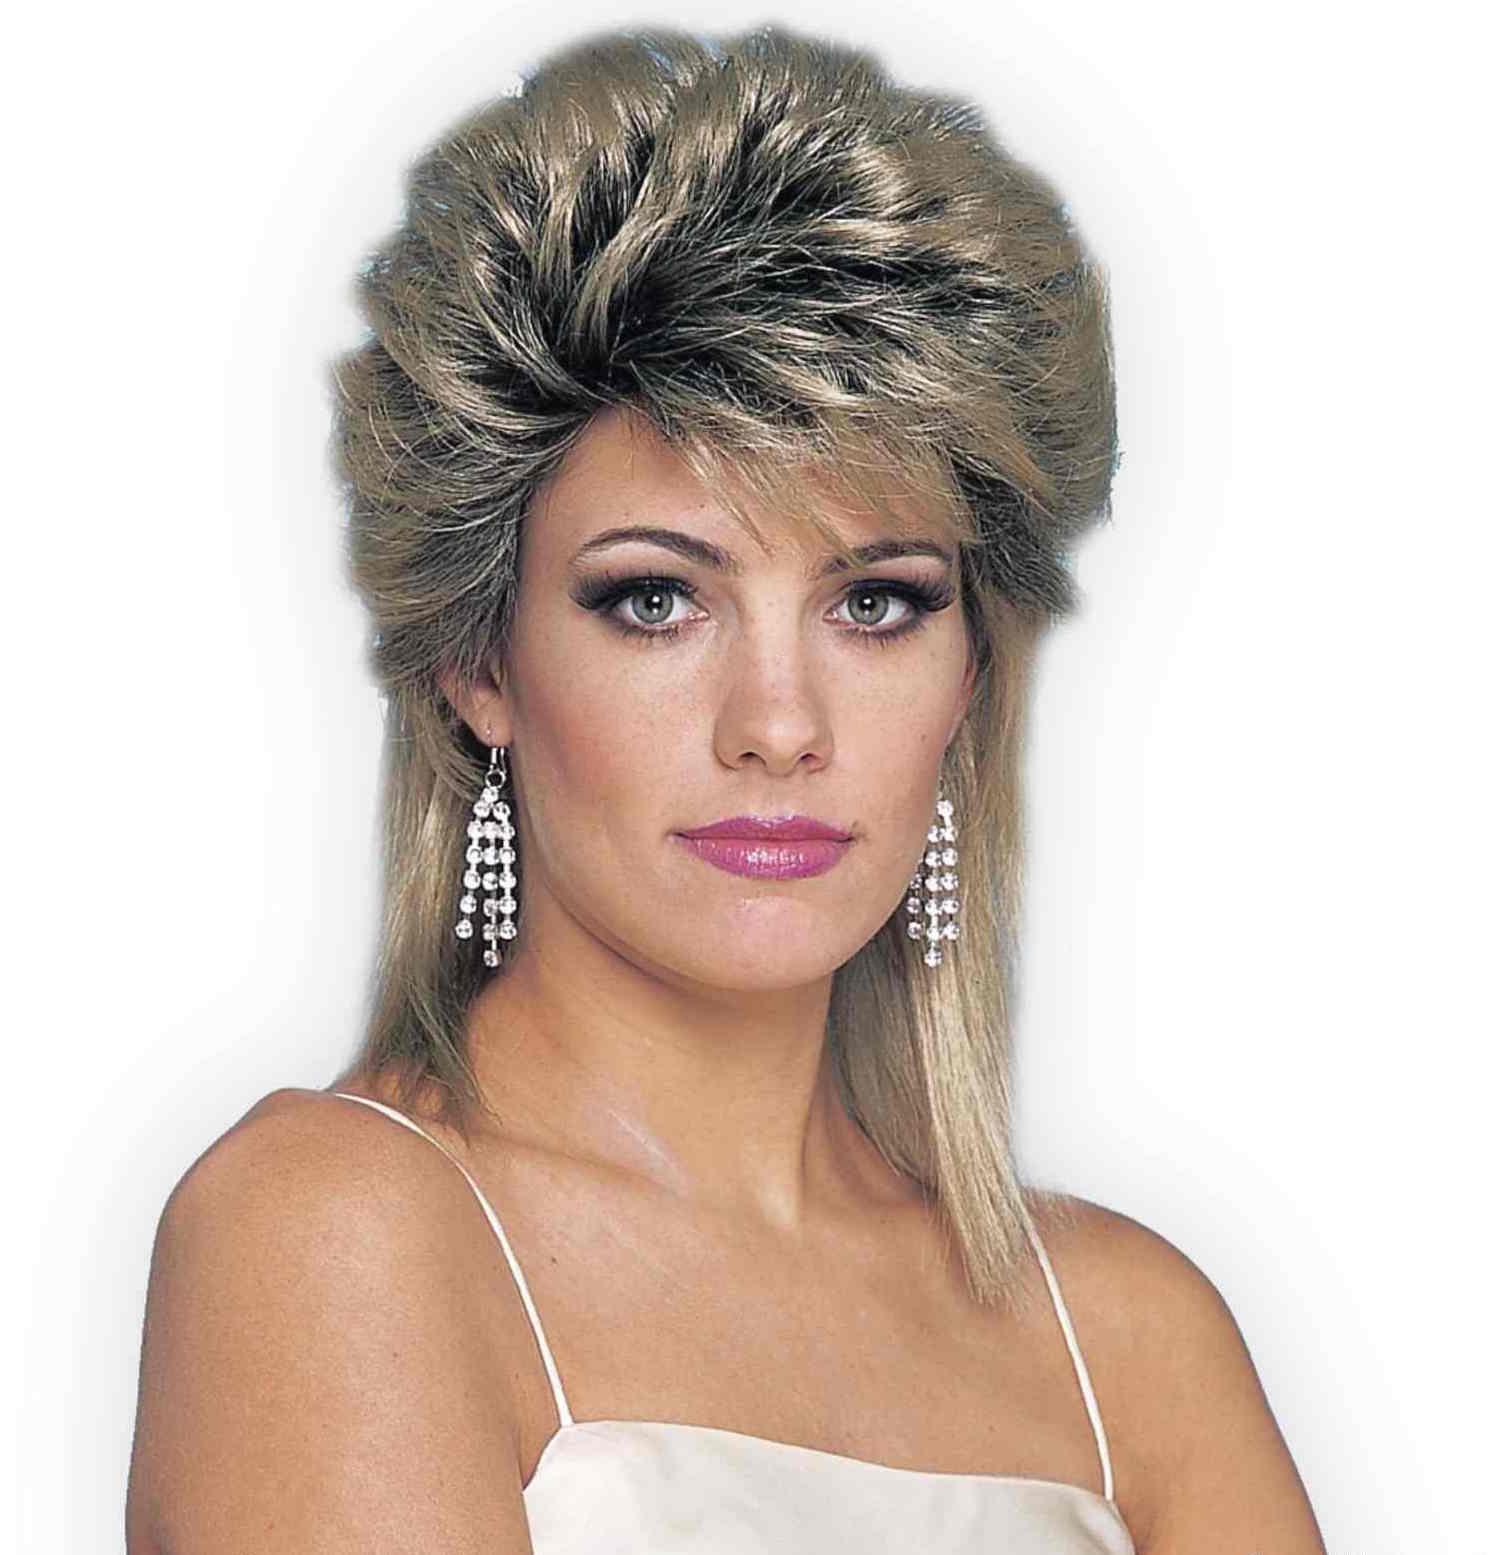 80s Womens Hair Design – 5 Great 80s Design Ideas